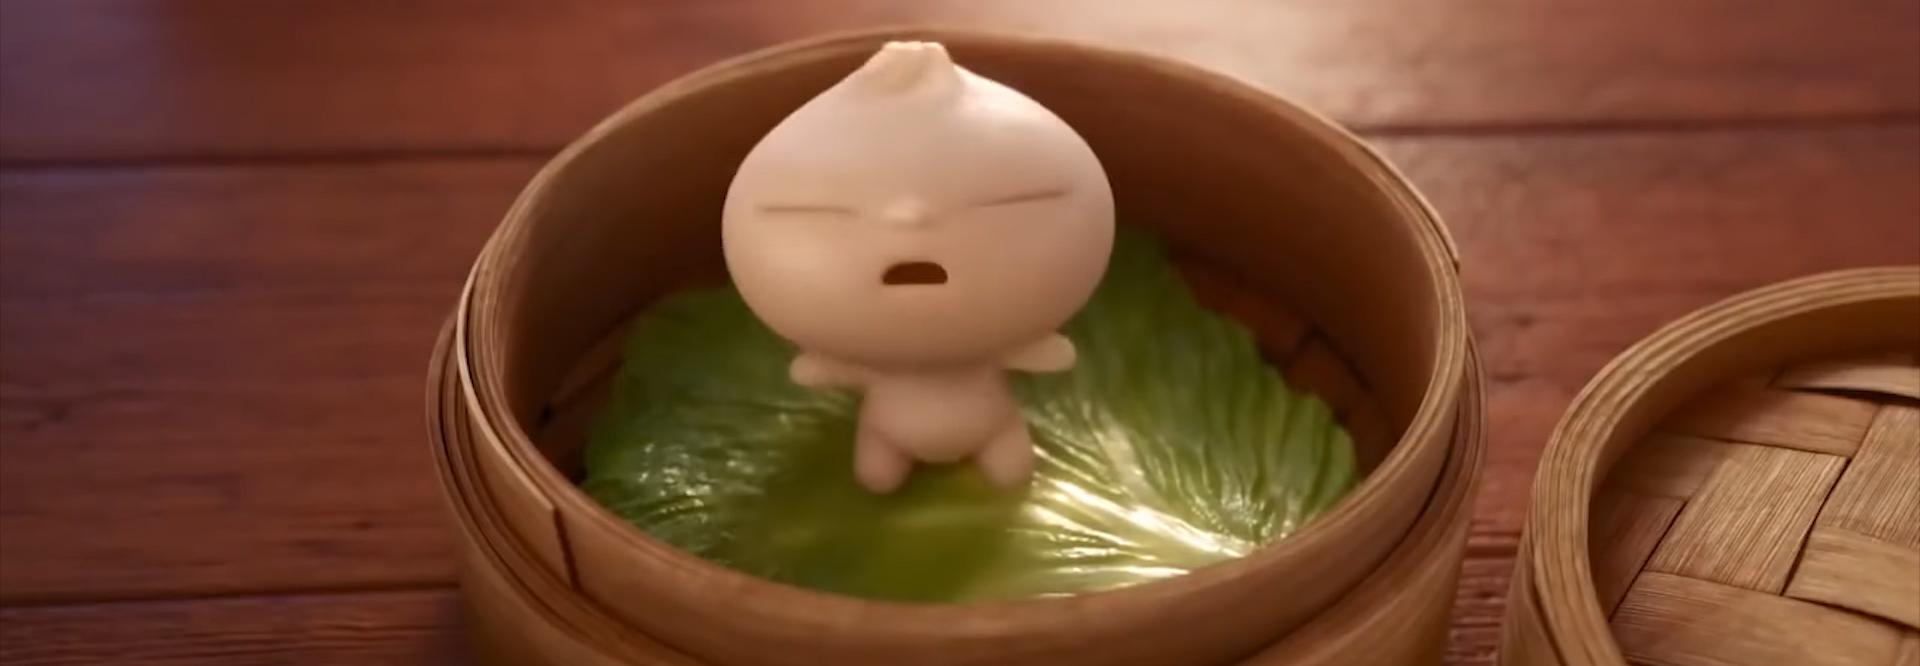 Bao. Image Credit: Pixar/Disney